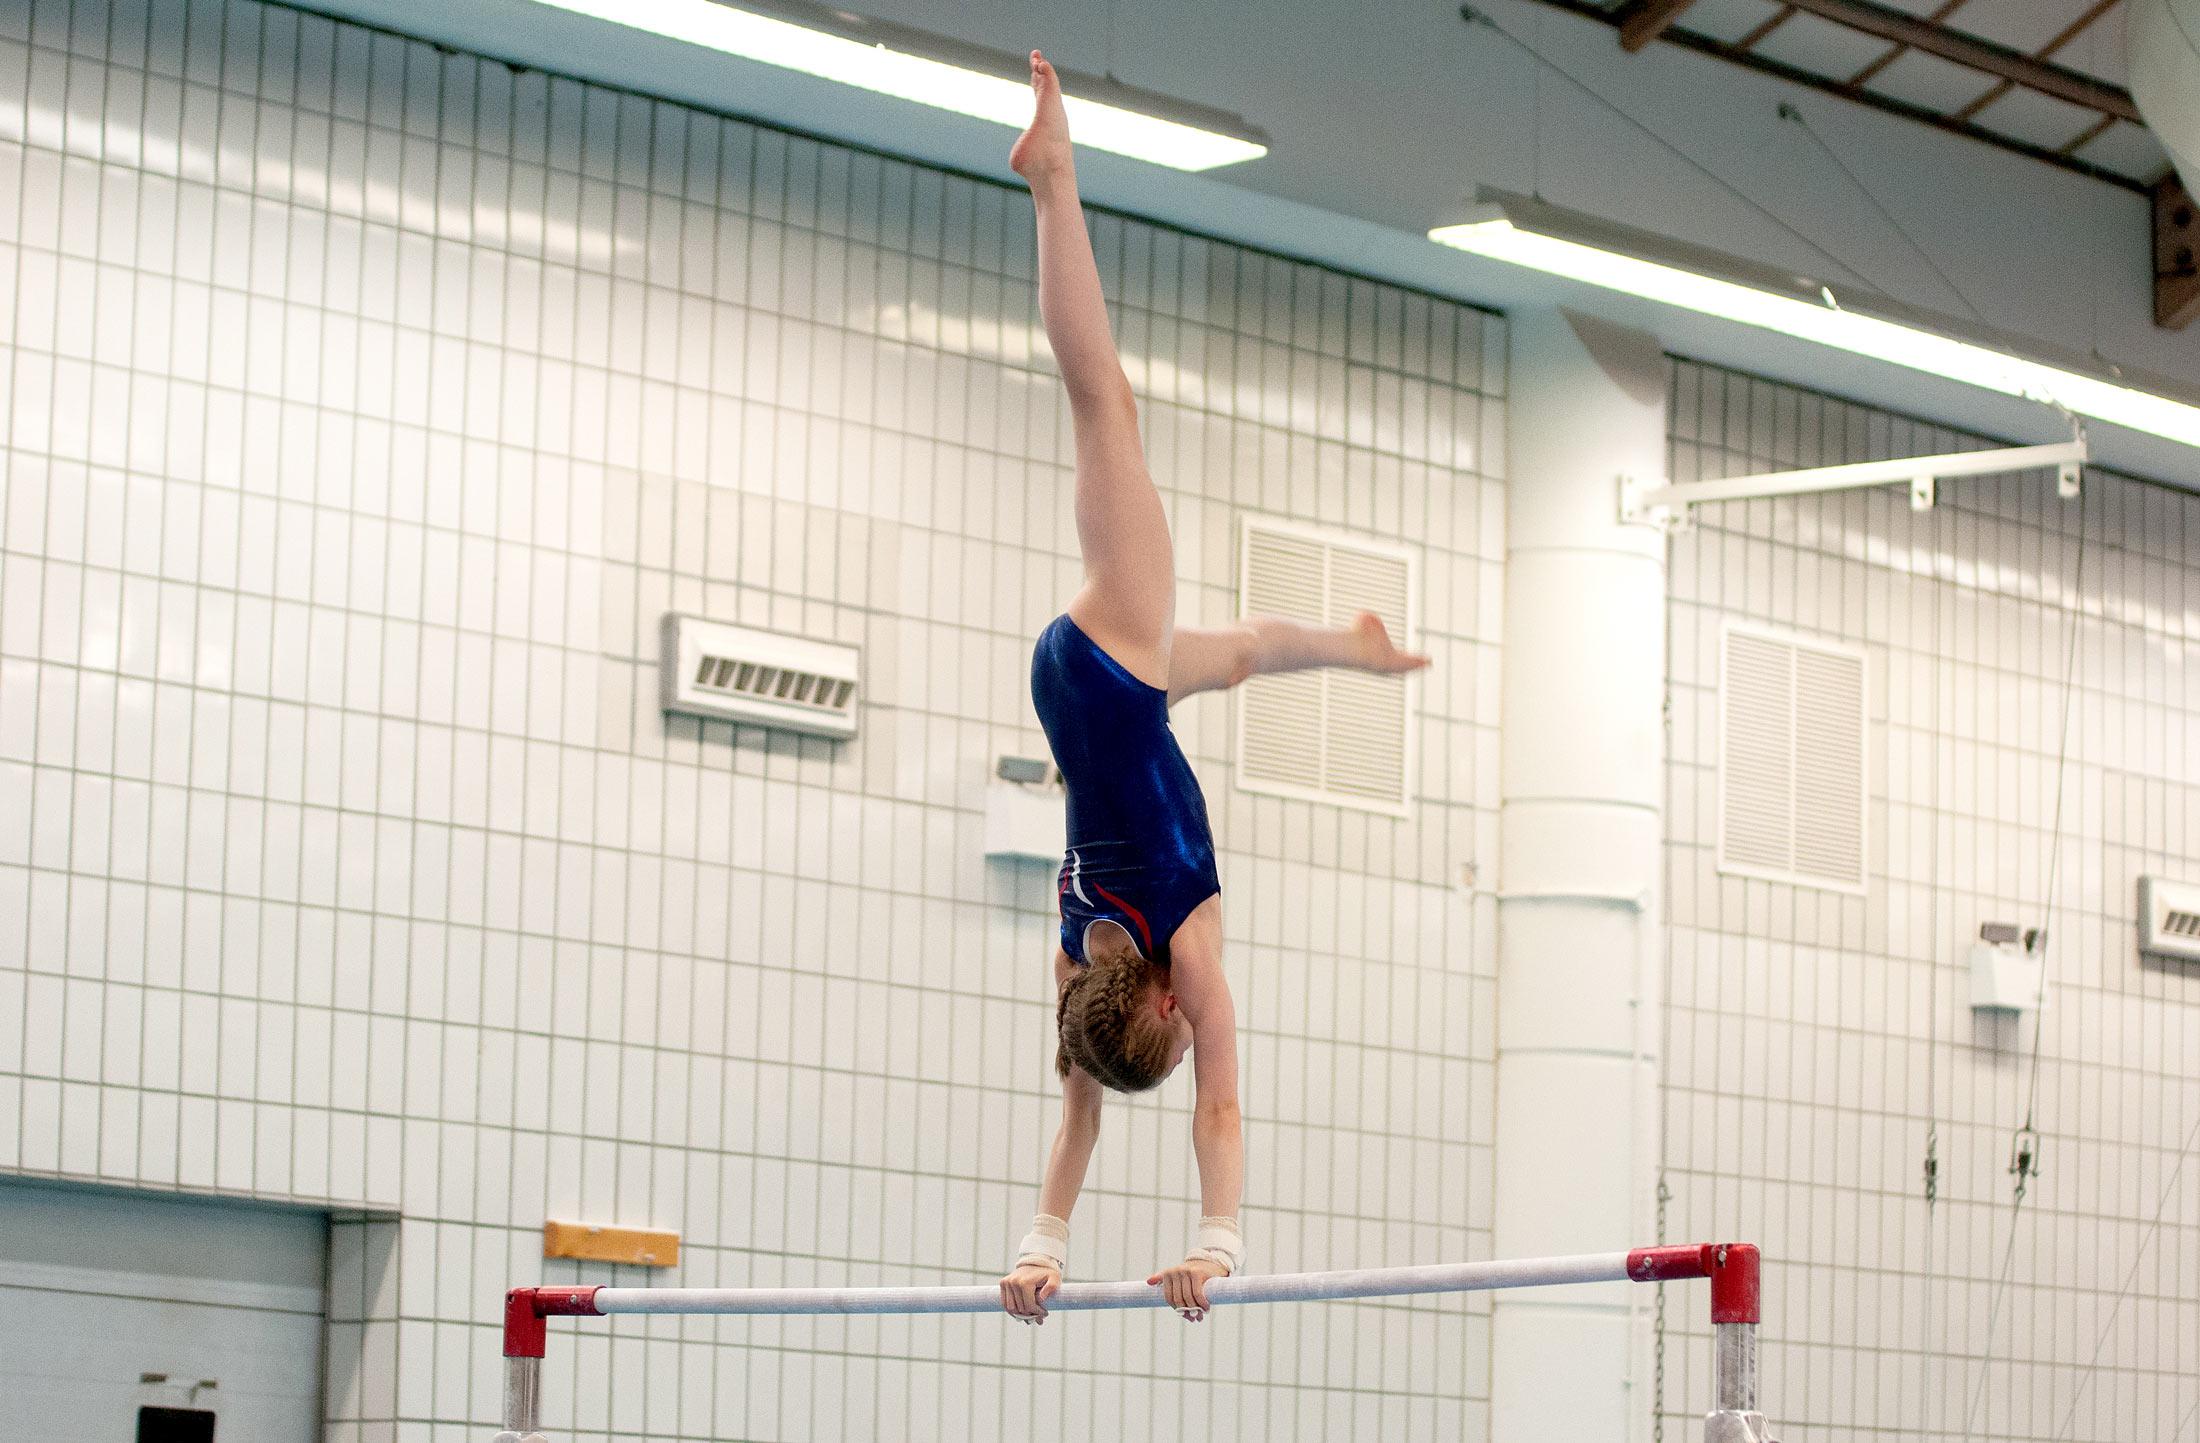 gymnast on asymmetric bars